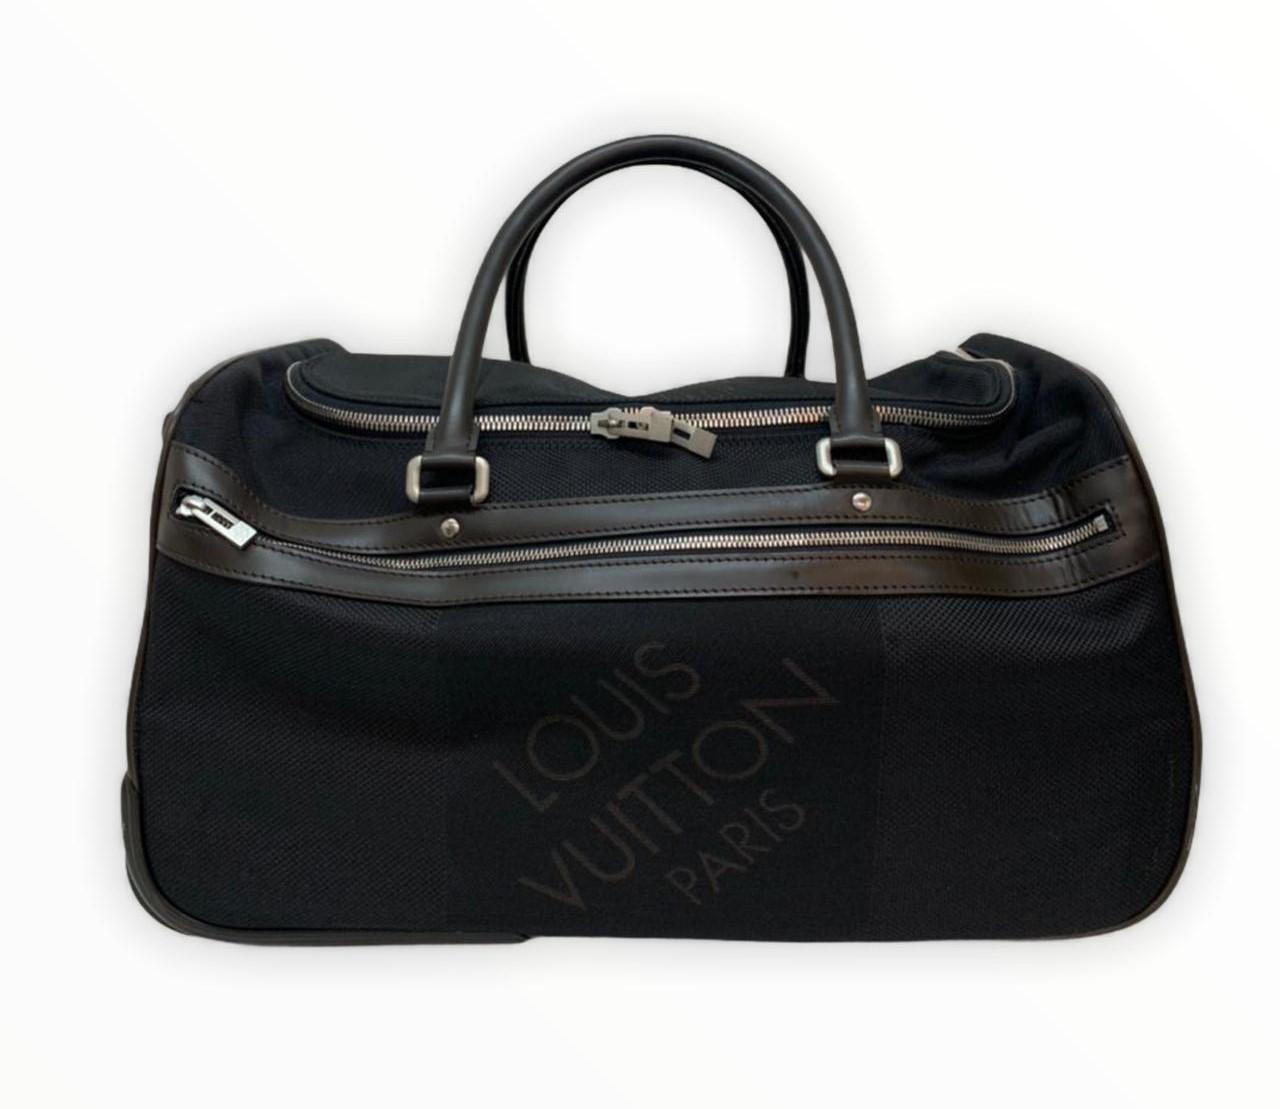 Mala de Rodas Louis Vuitton Damier Geant Eole 50